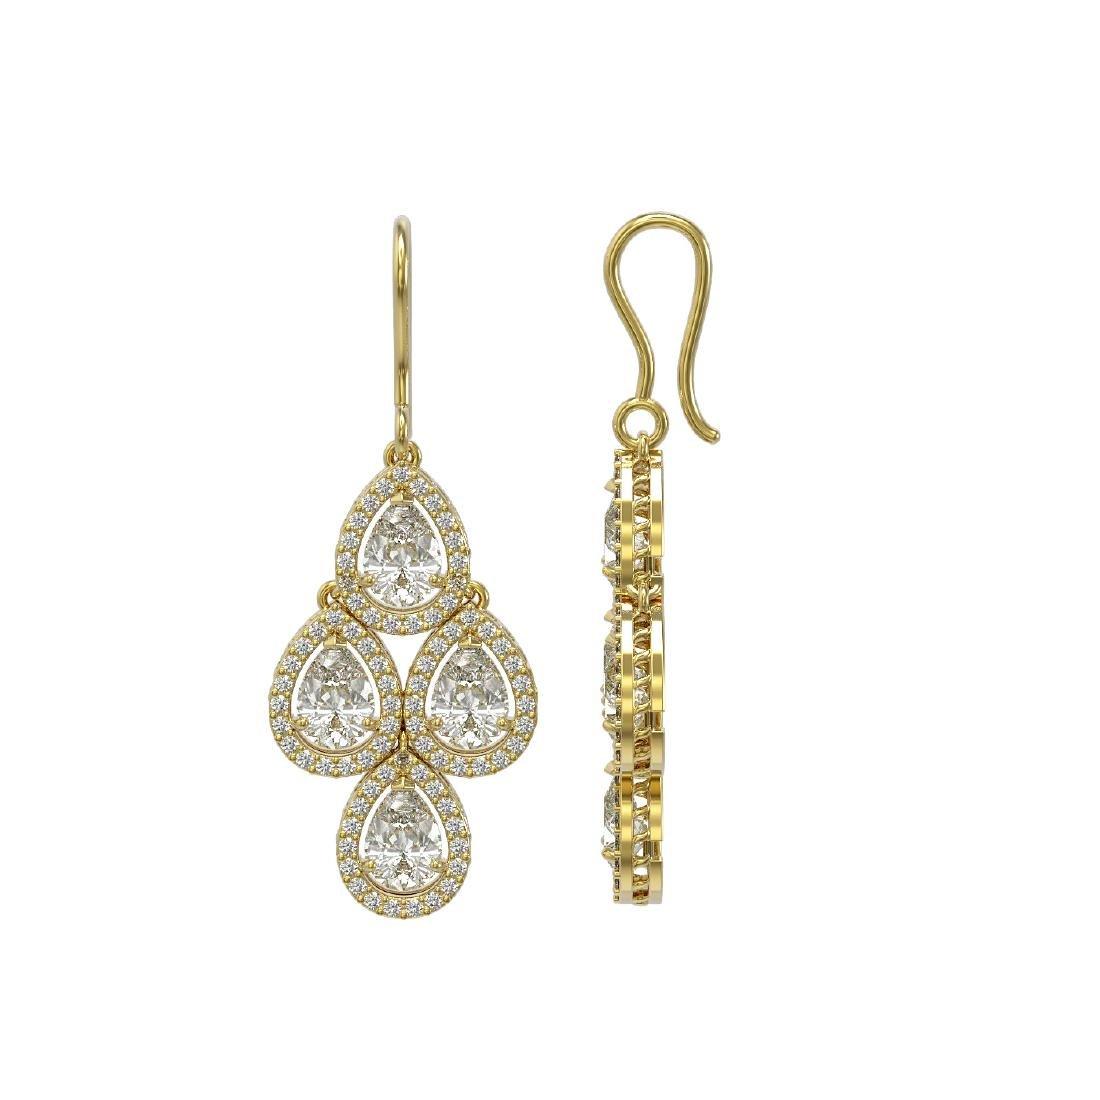 5.85 CTW Pear Diamond Designer Earrings 18K Yellow Gold - 2